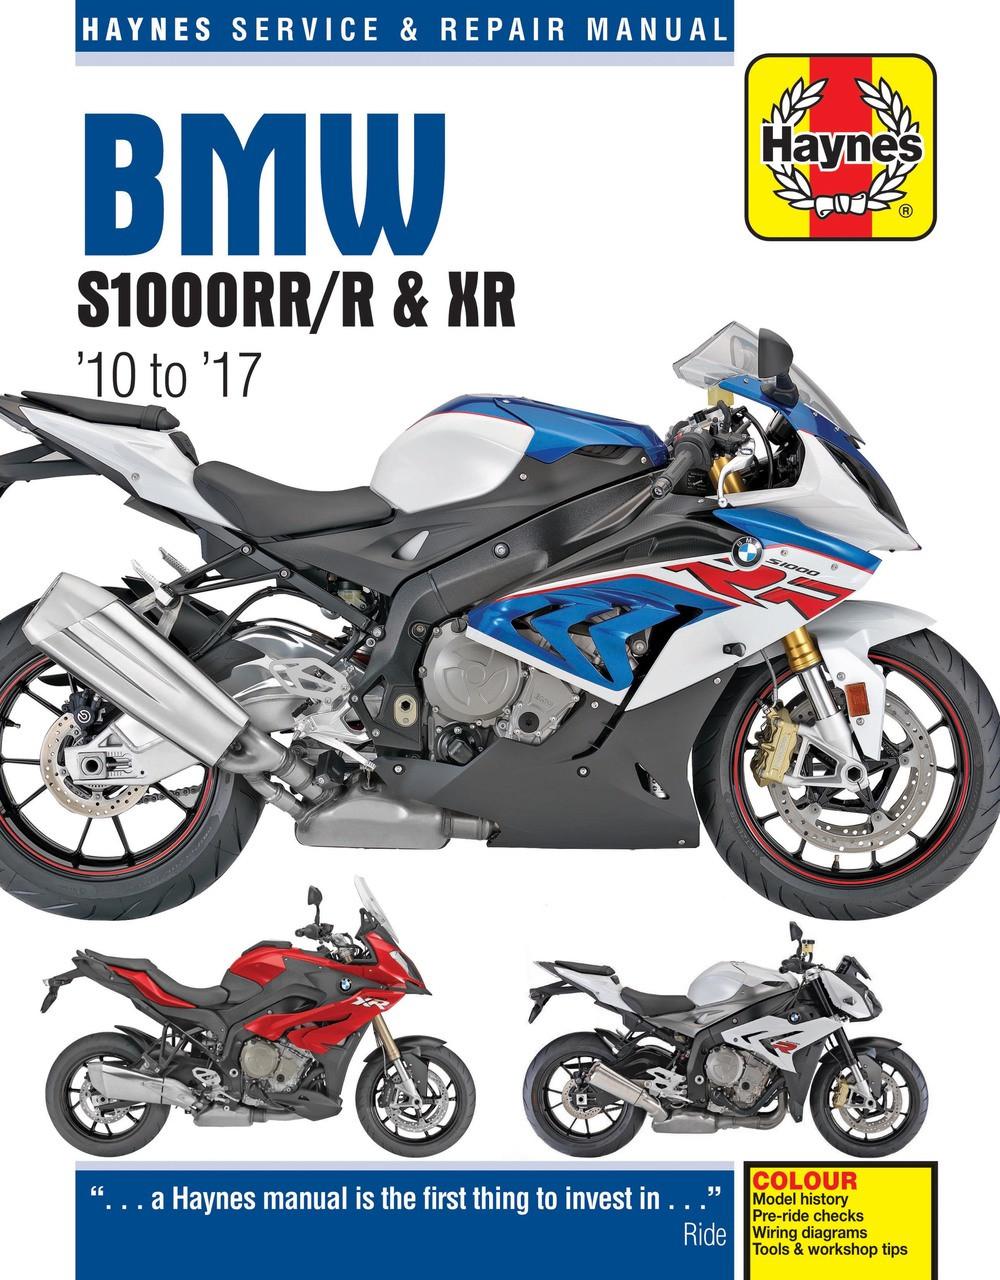 medium resolution of bmw s1000rr s1000r s1000xr 2010 2017 workshop manual